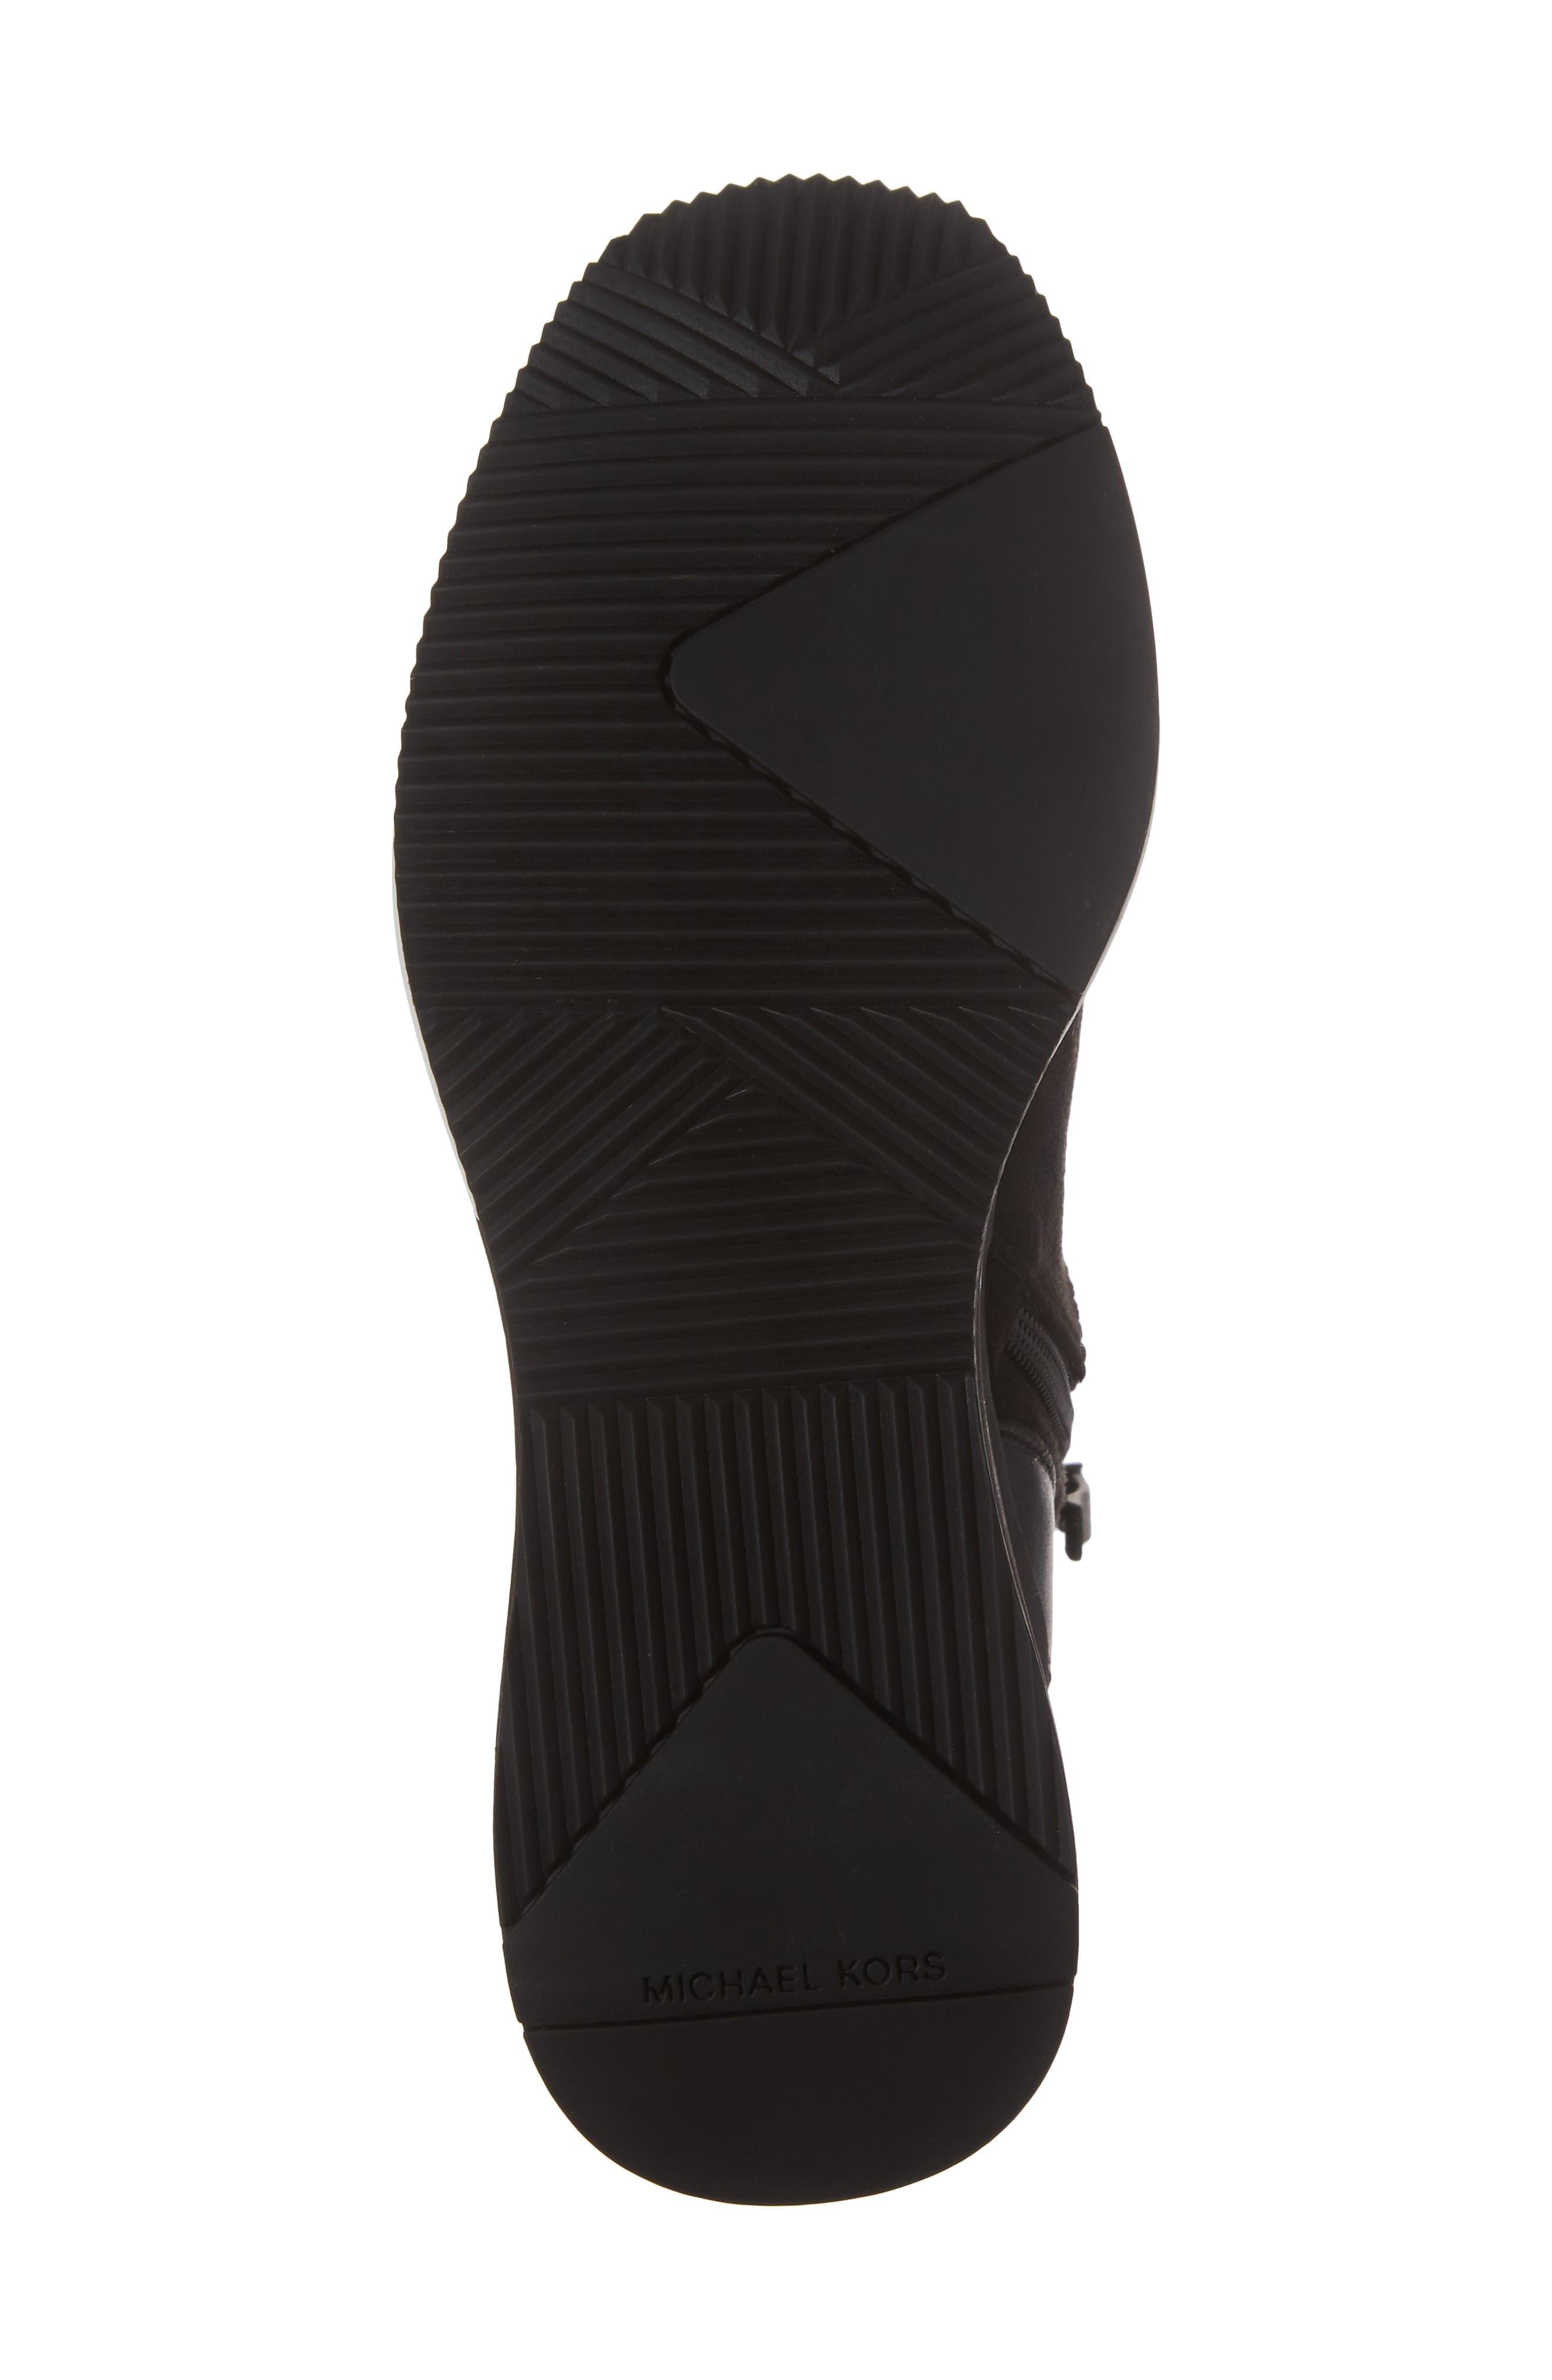 'Ace' Wedge Sneaker Bootie,                             Alternate thumbnail 6, color,                             BLACK SUEDE